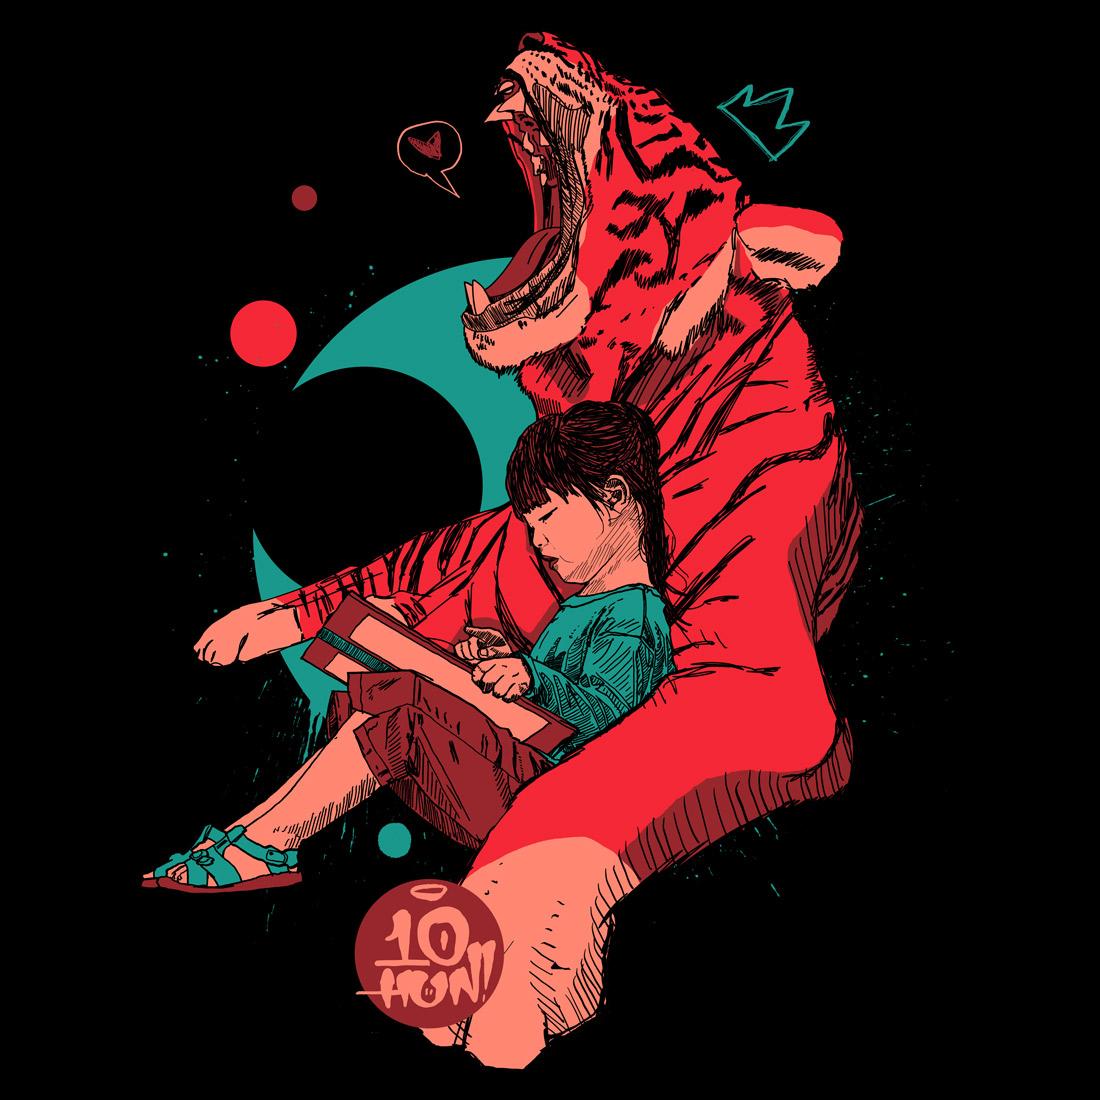 Tiger-Shirt2-SQUARE.jpg